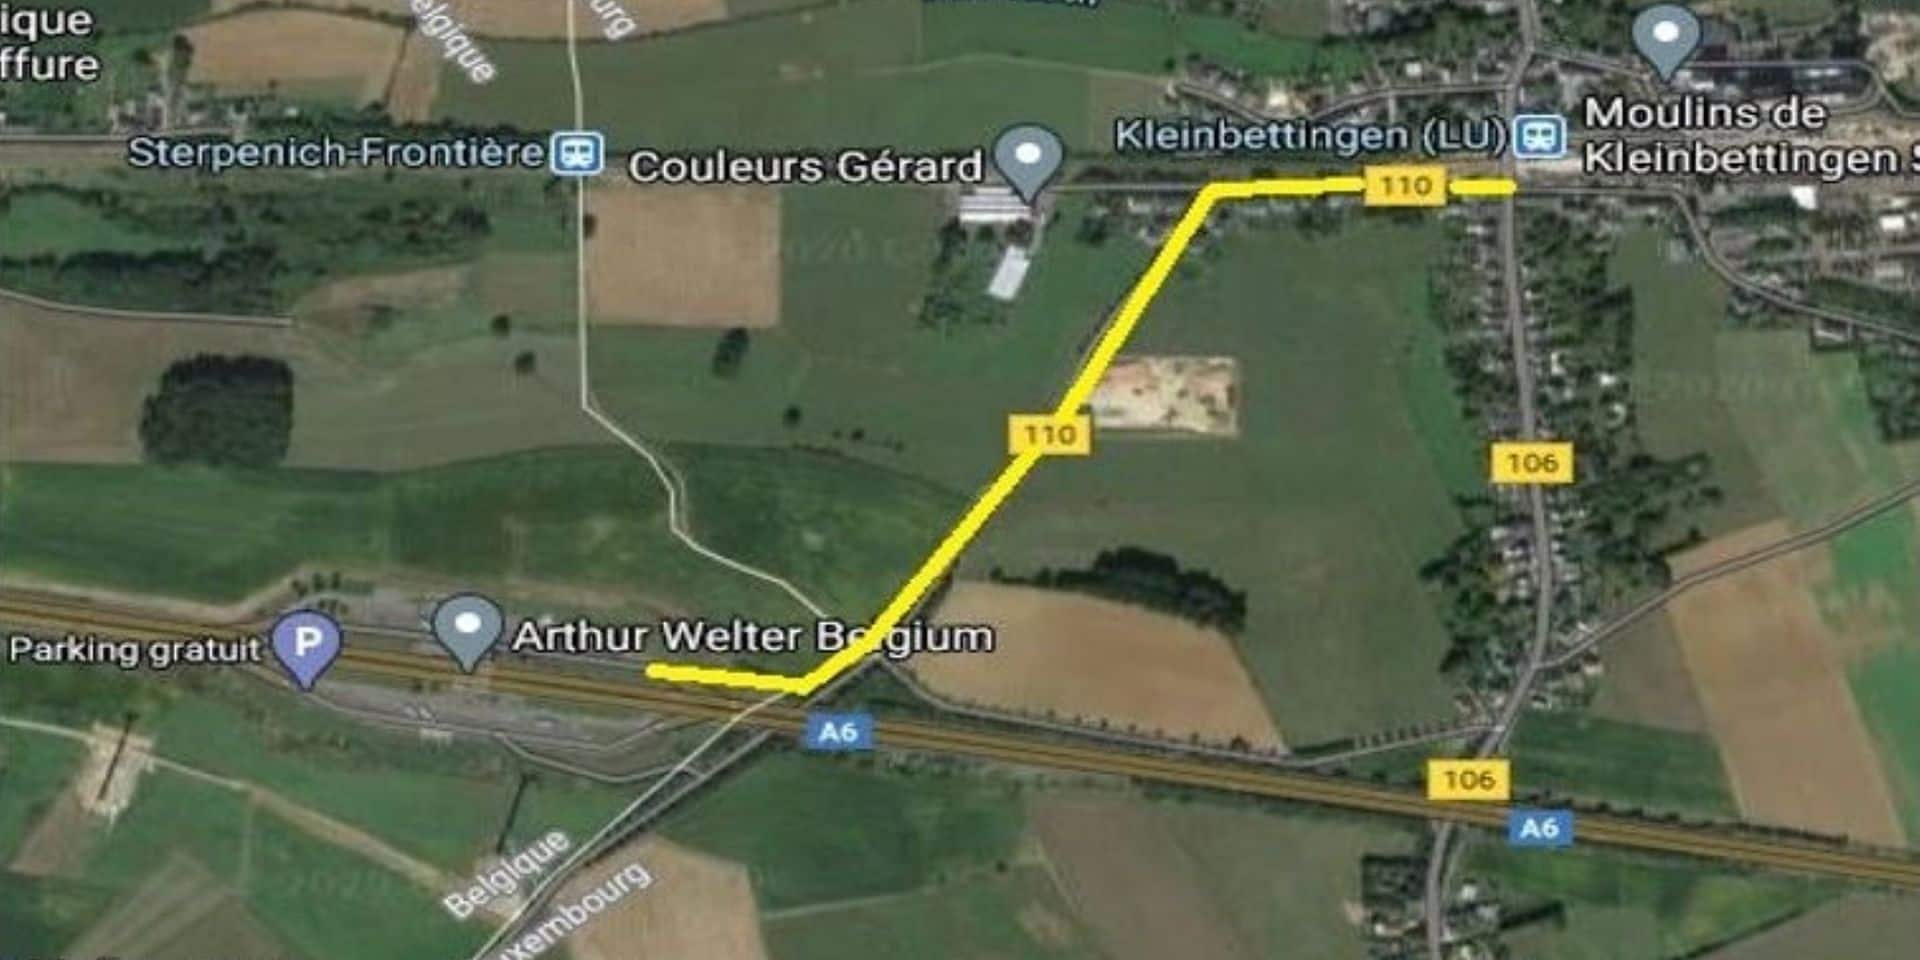 Sterpenich (Arlon) : une liaison vers la gare de Kleinbettingen ?